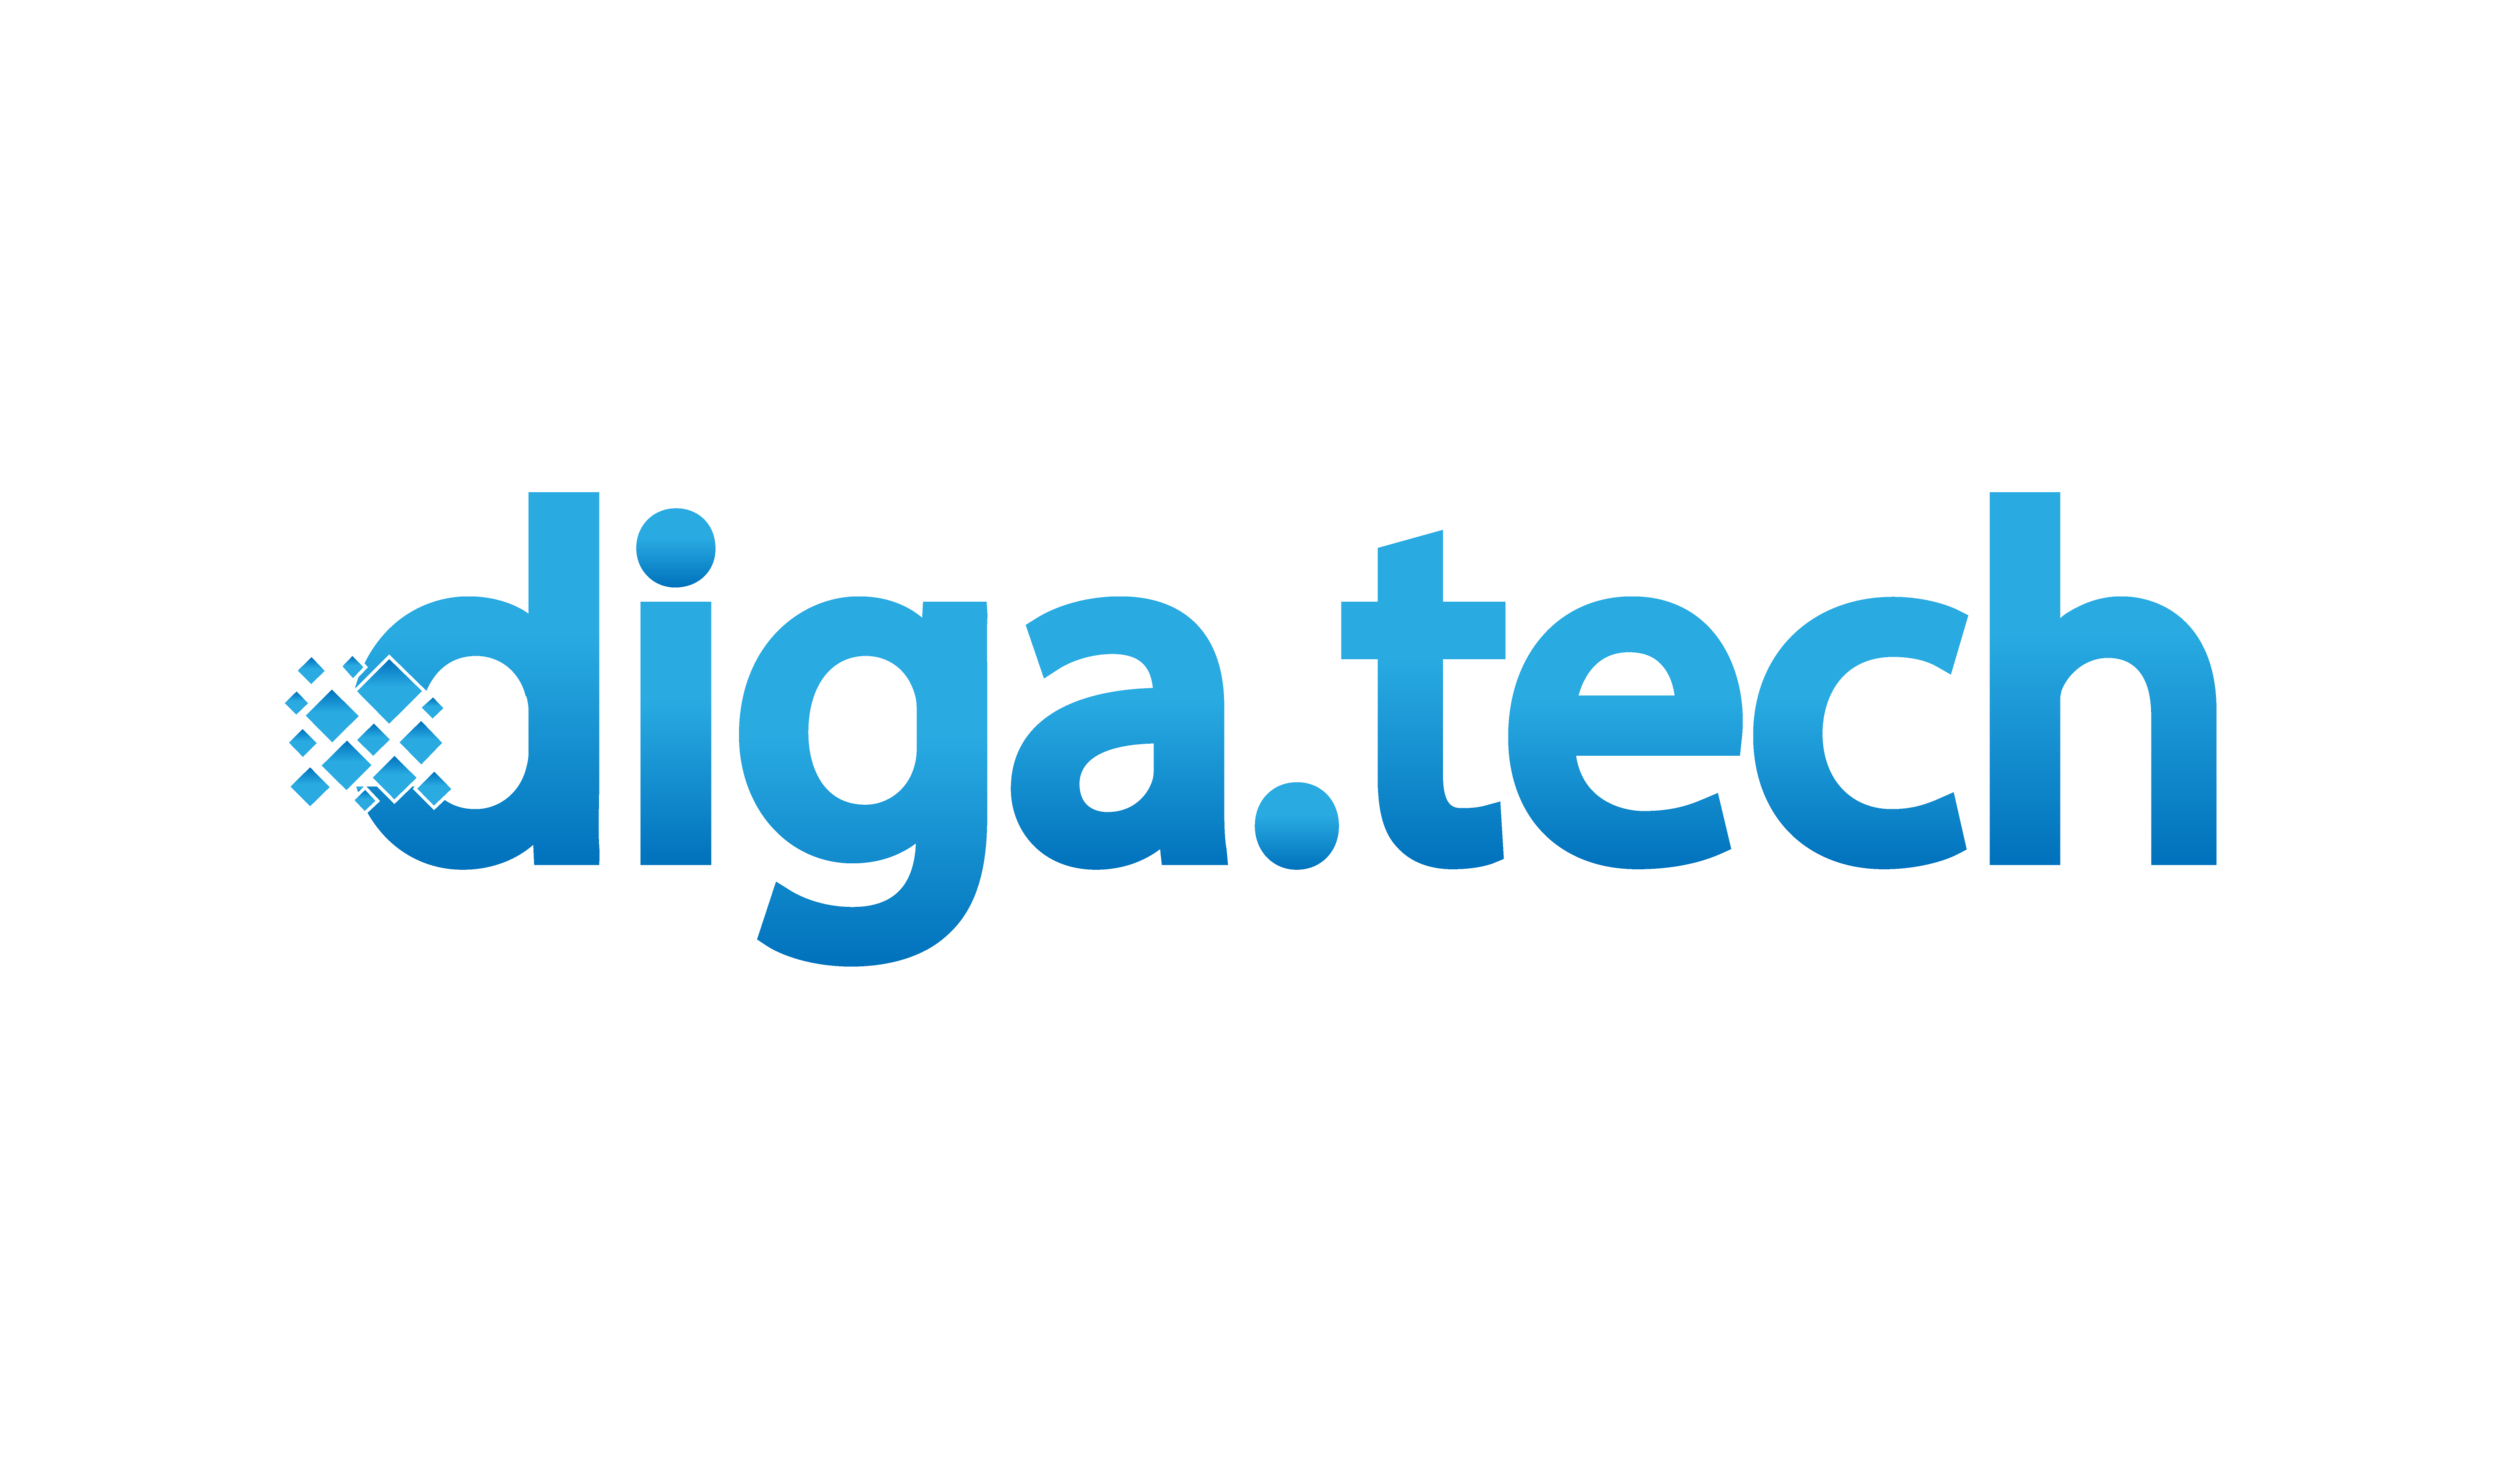 diga.tech Logo Clear FINAL.png